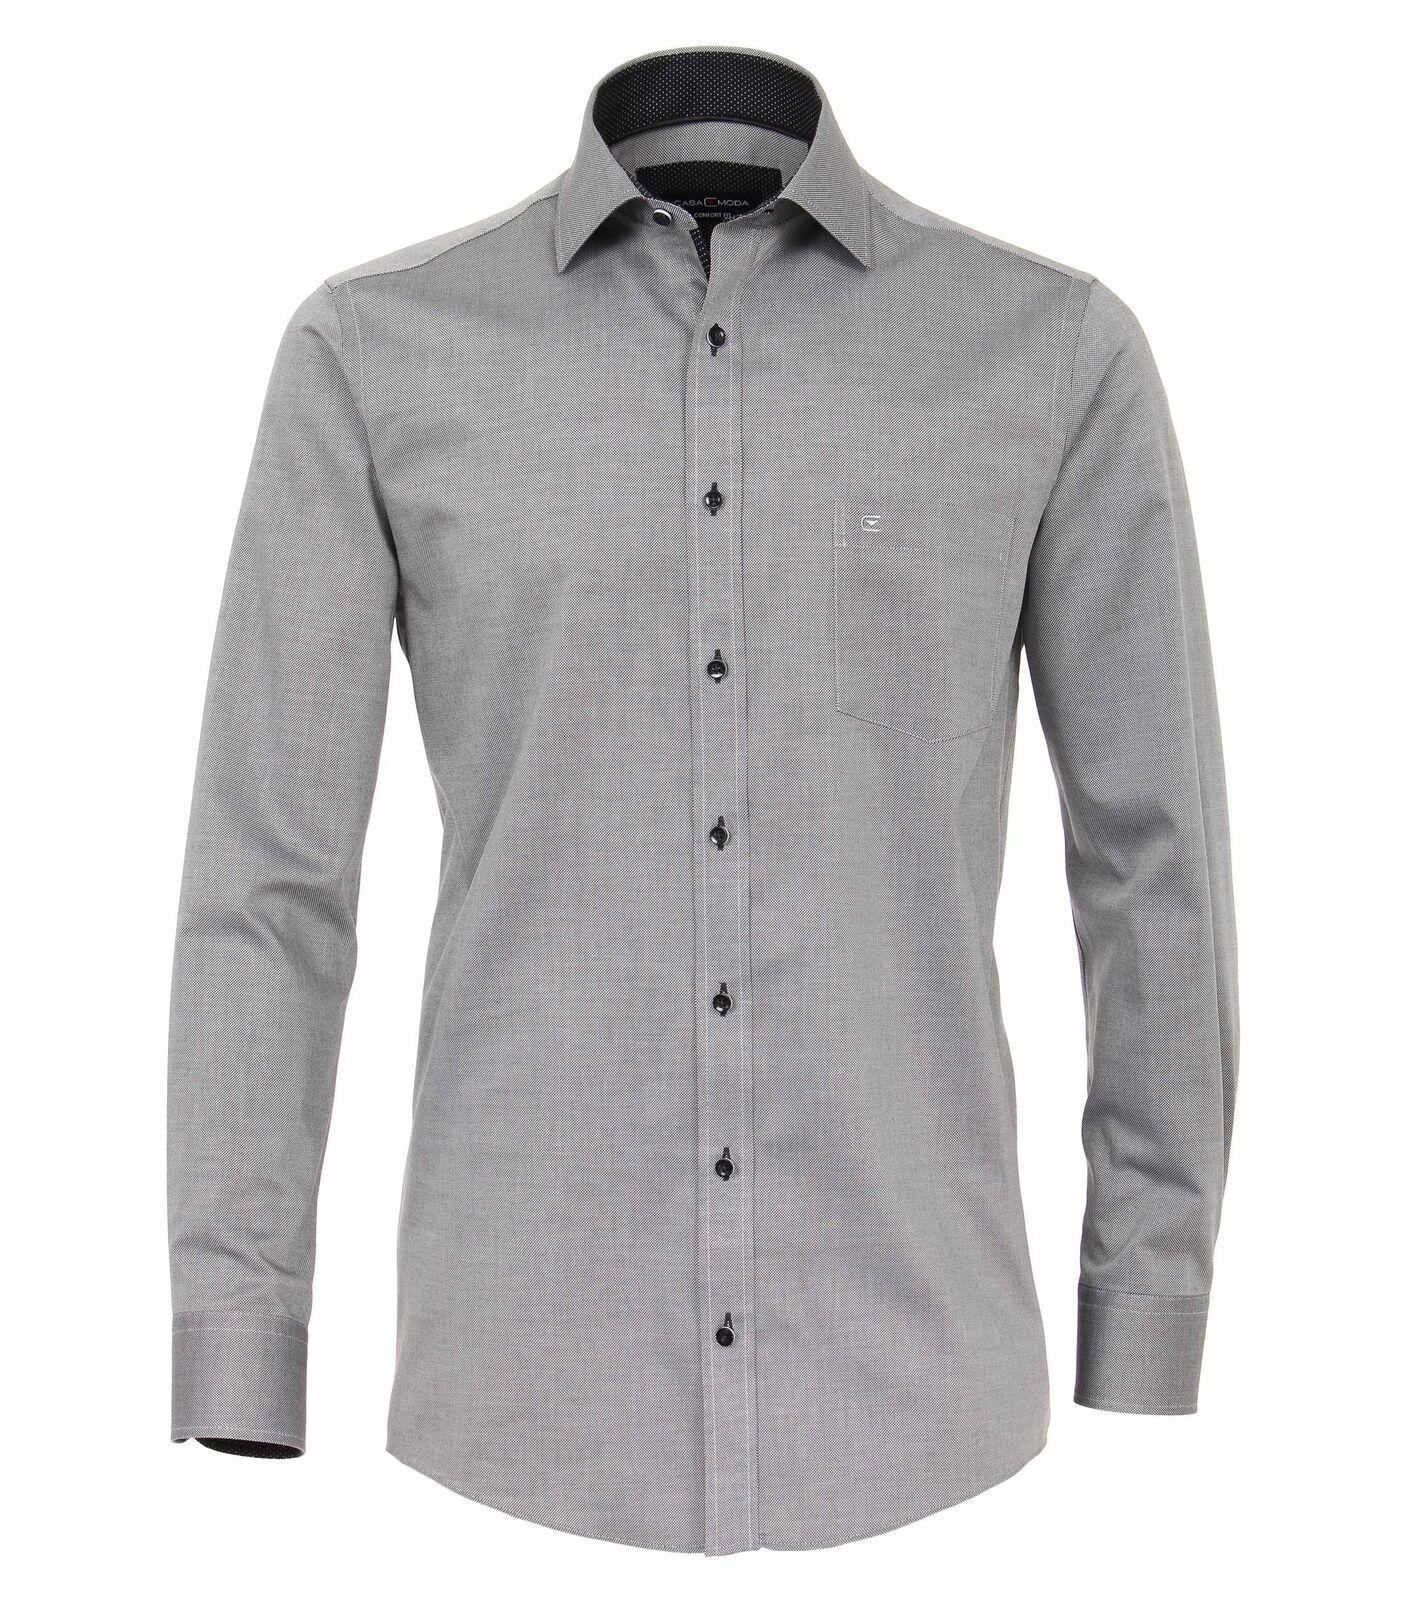 Casa Moda - Comfort Fit - - - Herren Hemd  mit Kent Kragen (383060000) | Günstig  4cf1f5